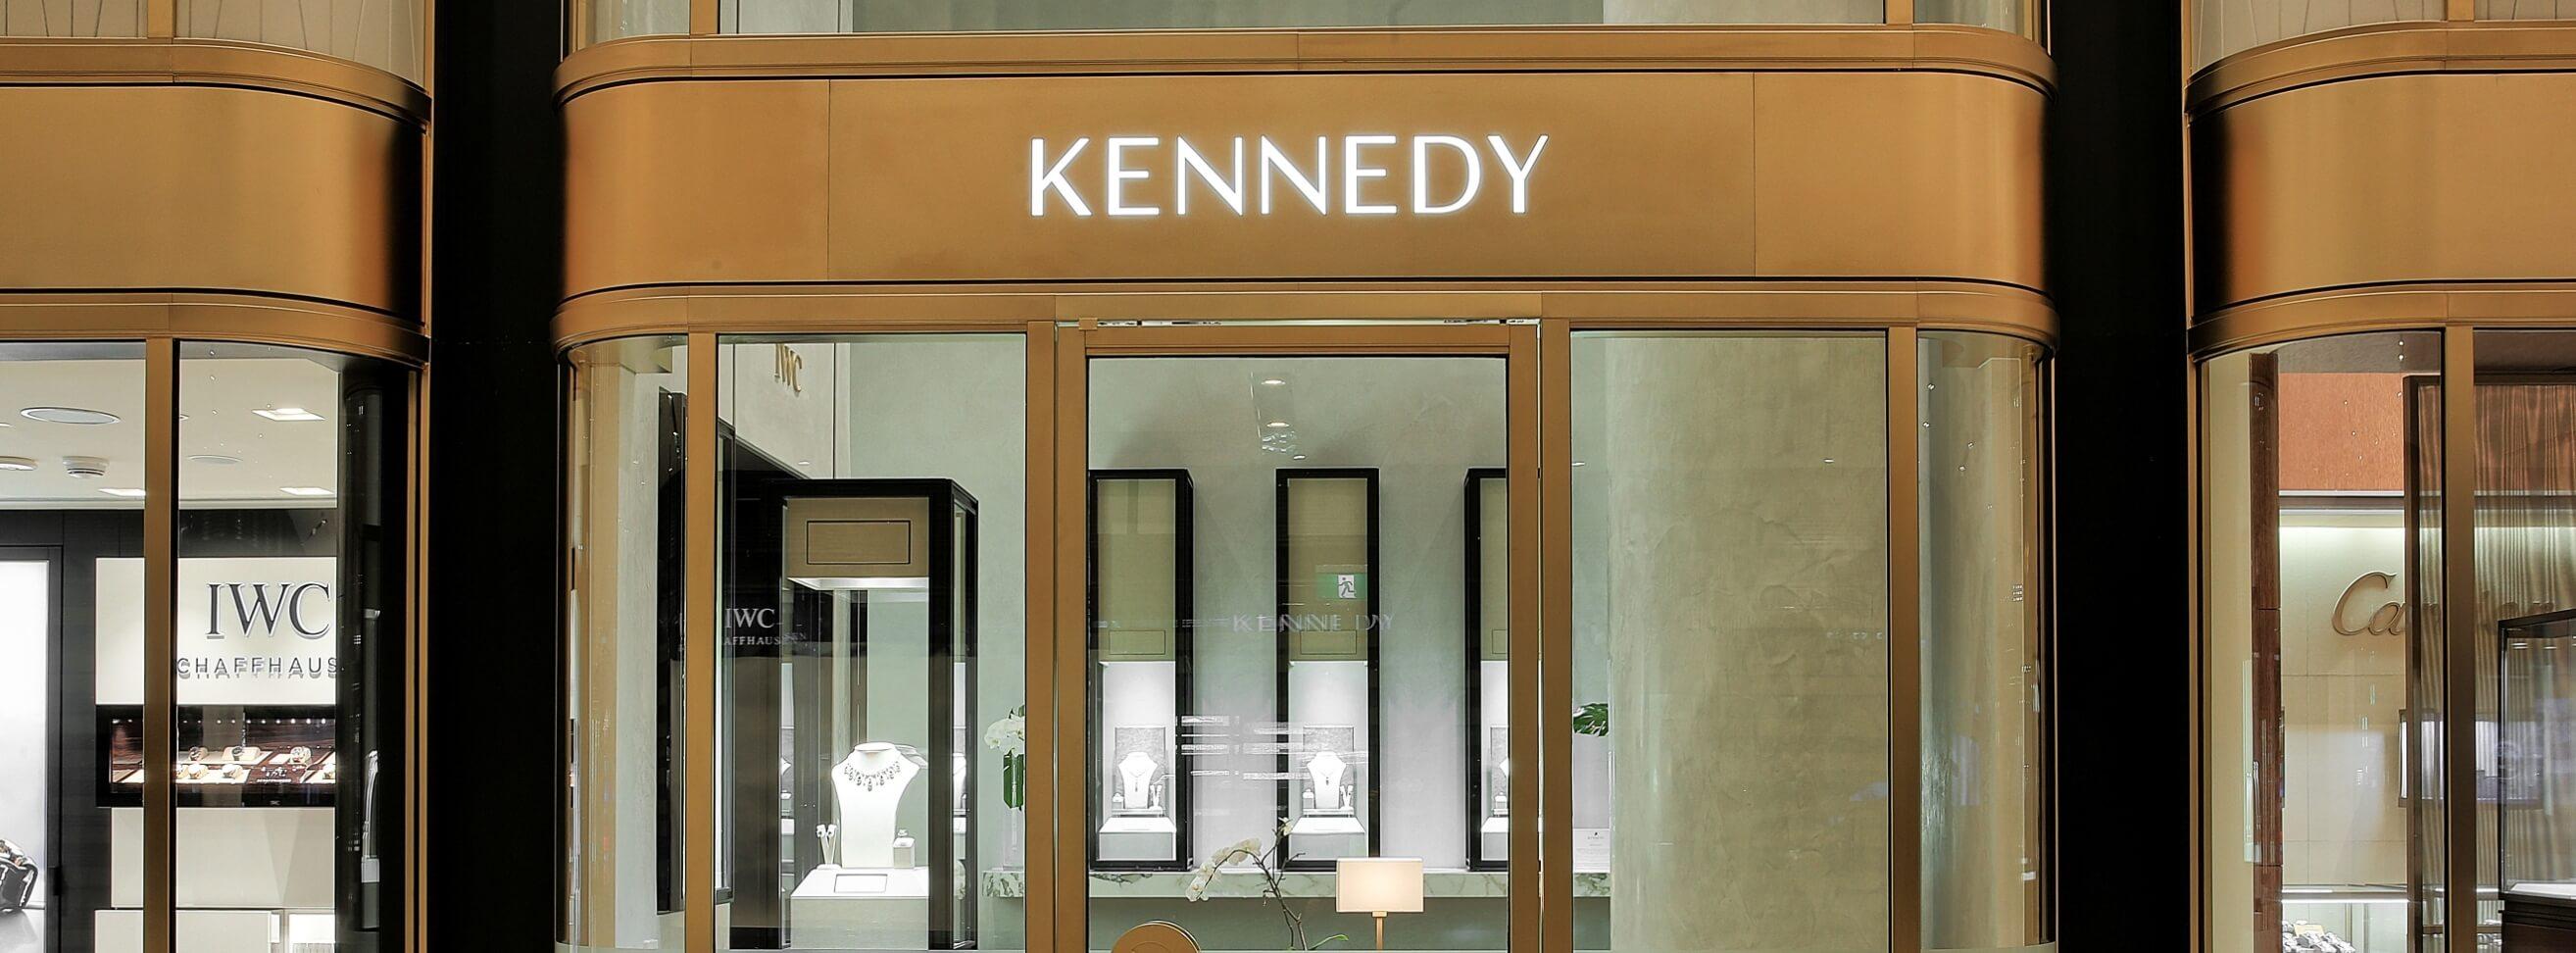 Kennedy desktop shoppingatkennedy 2x 2x